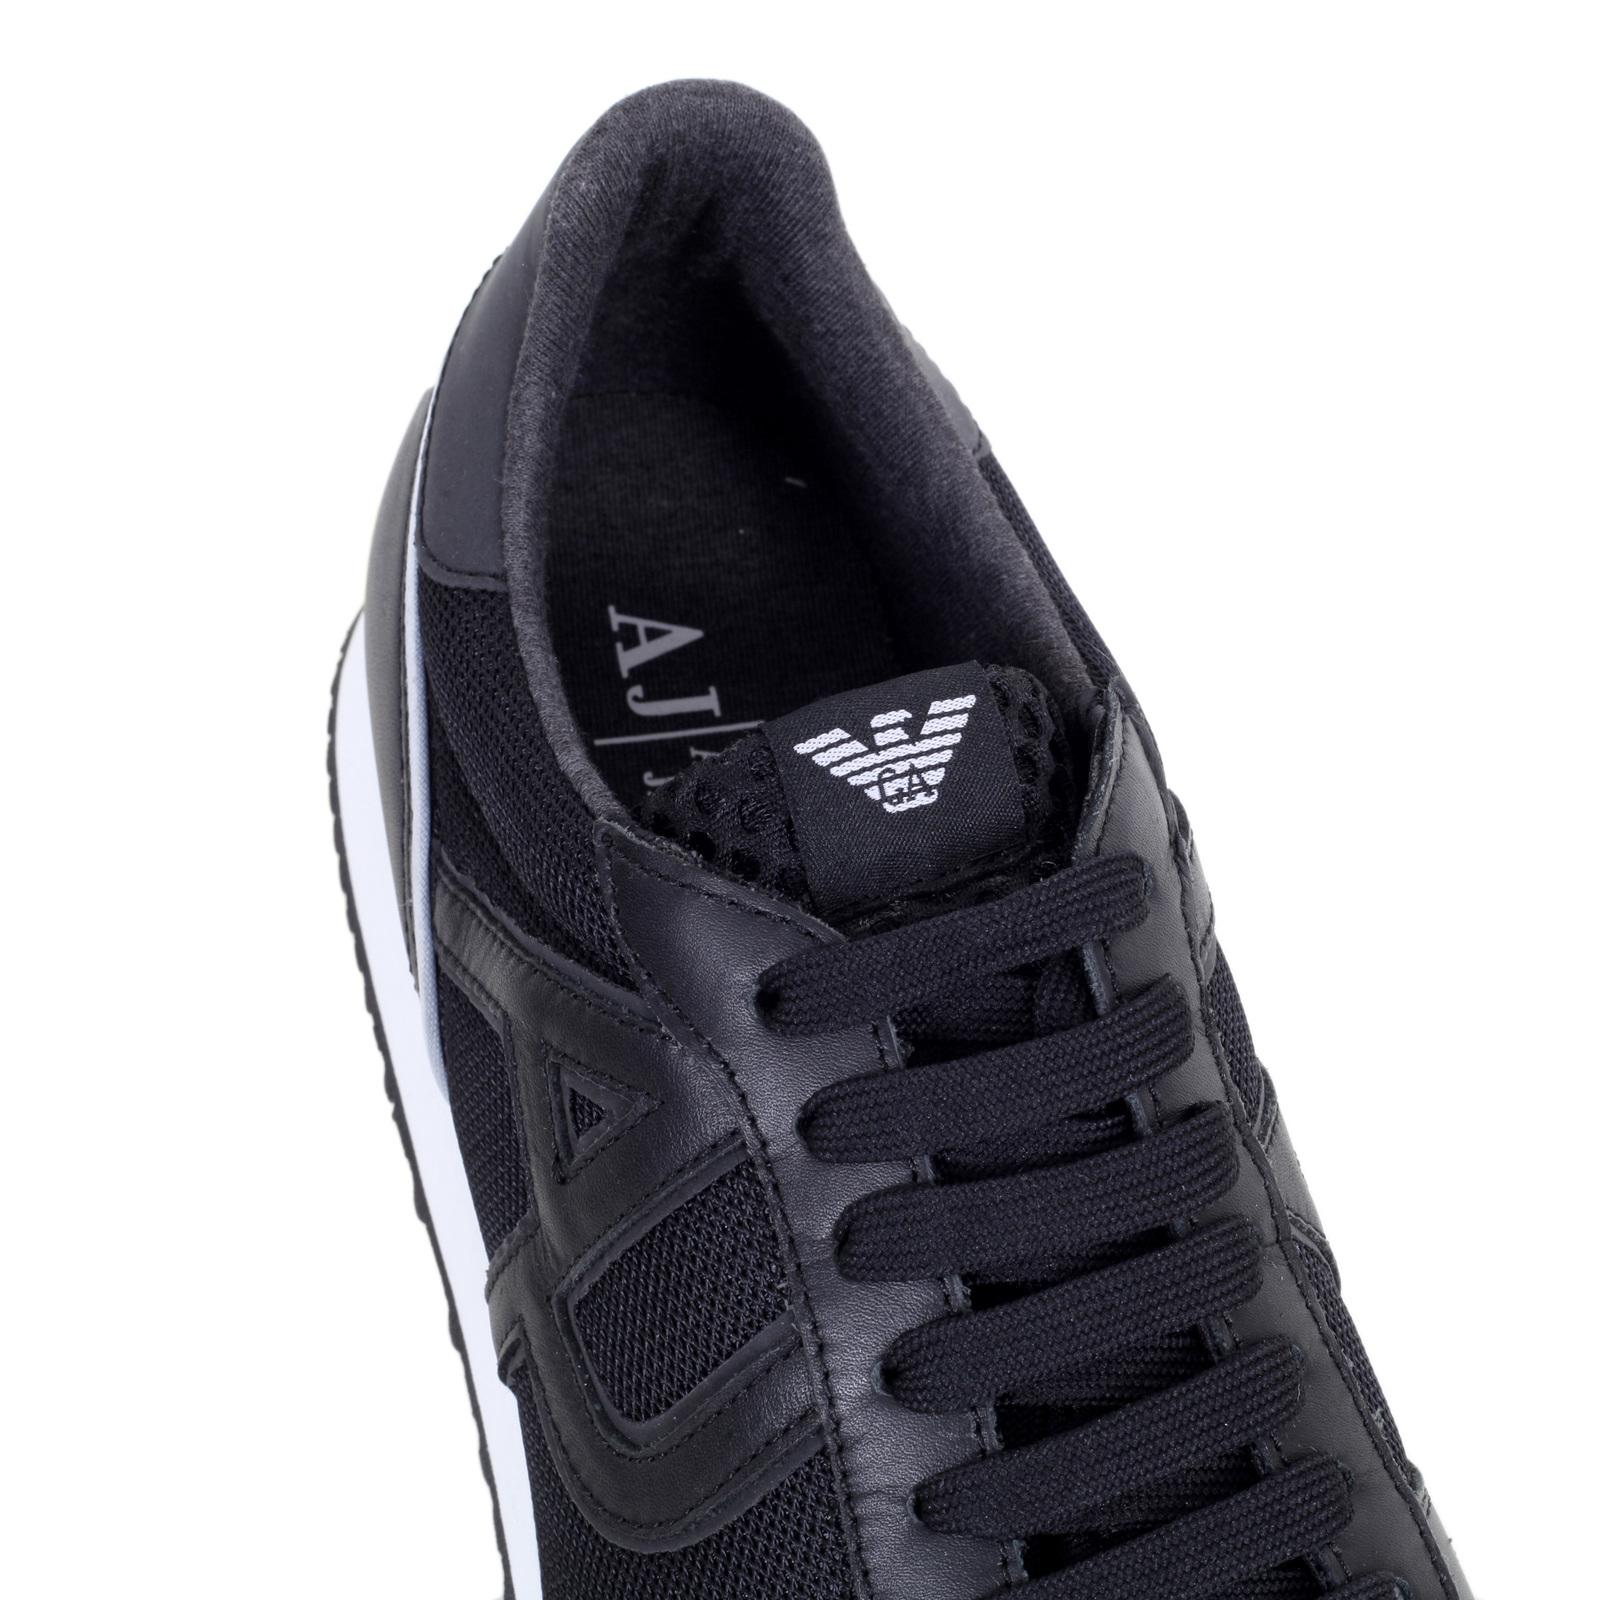 Leather Sneakers Black Top Low Buy Nylon Armani Jeans rBoCxEQeWd